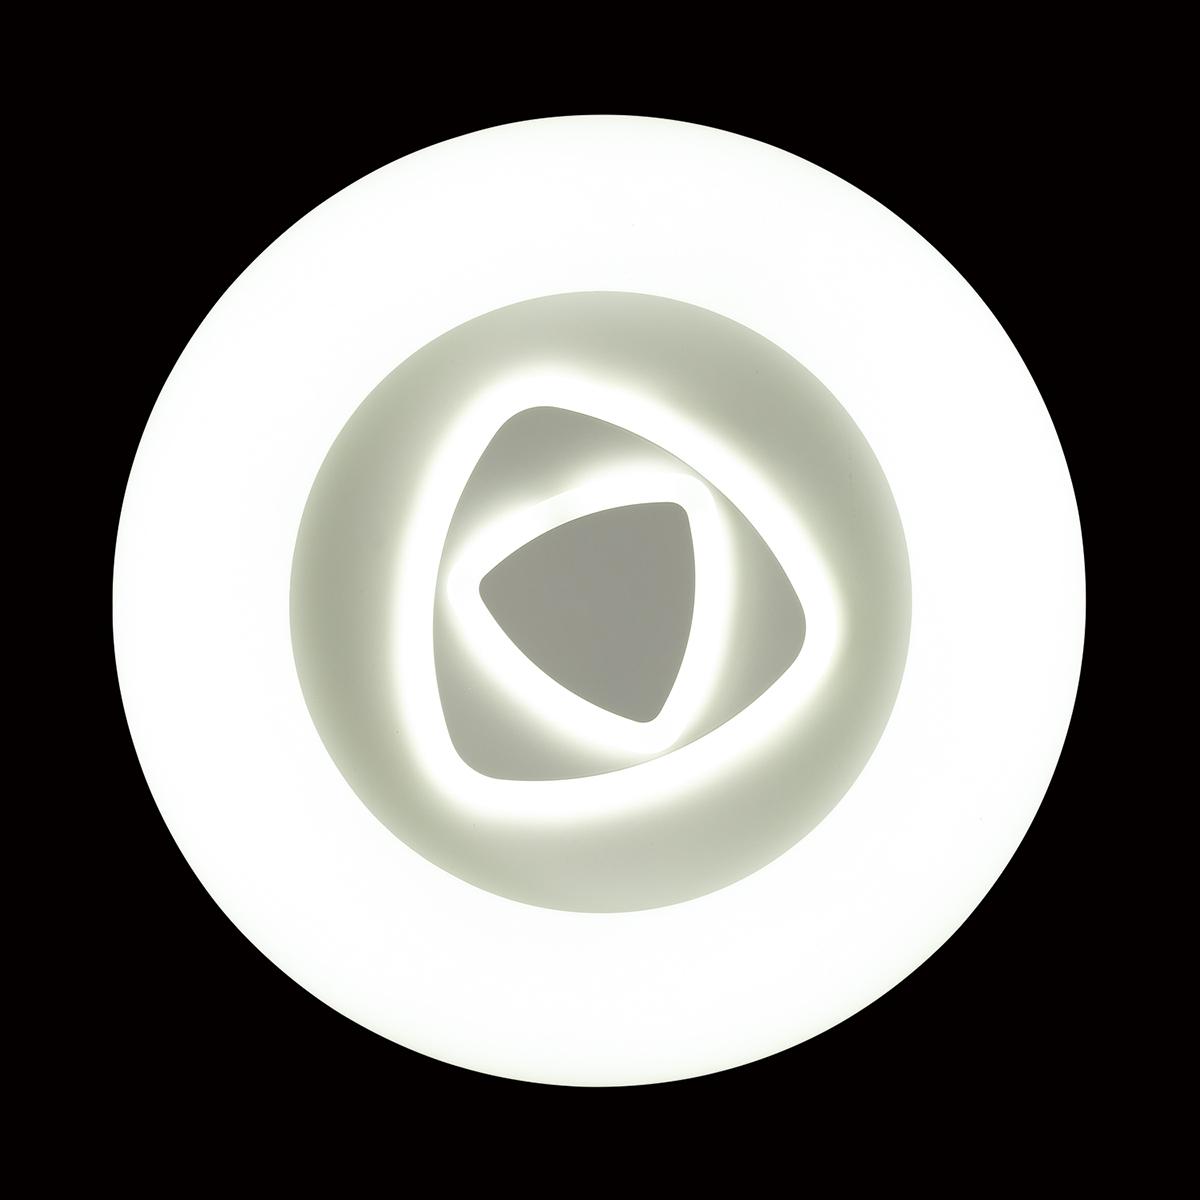 Потолочная люстра Lumion Otto 4419/99CL, белый, металл, пластик - фото 6